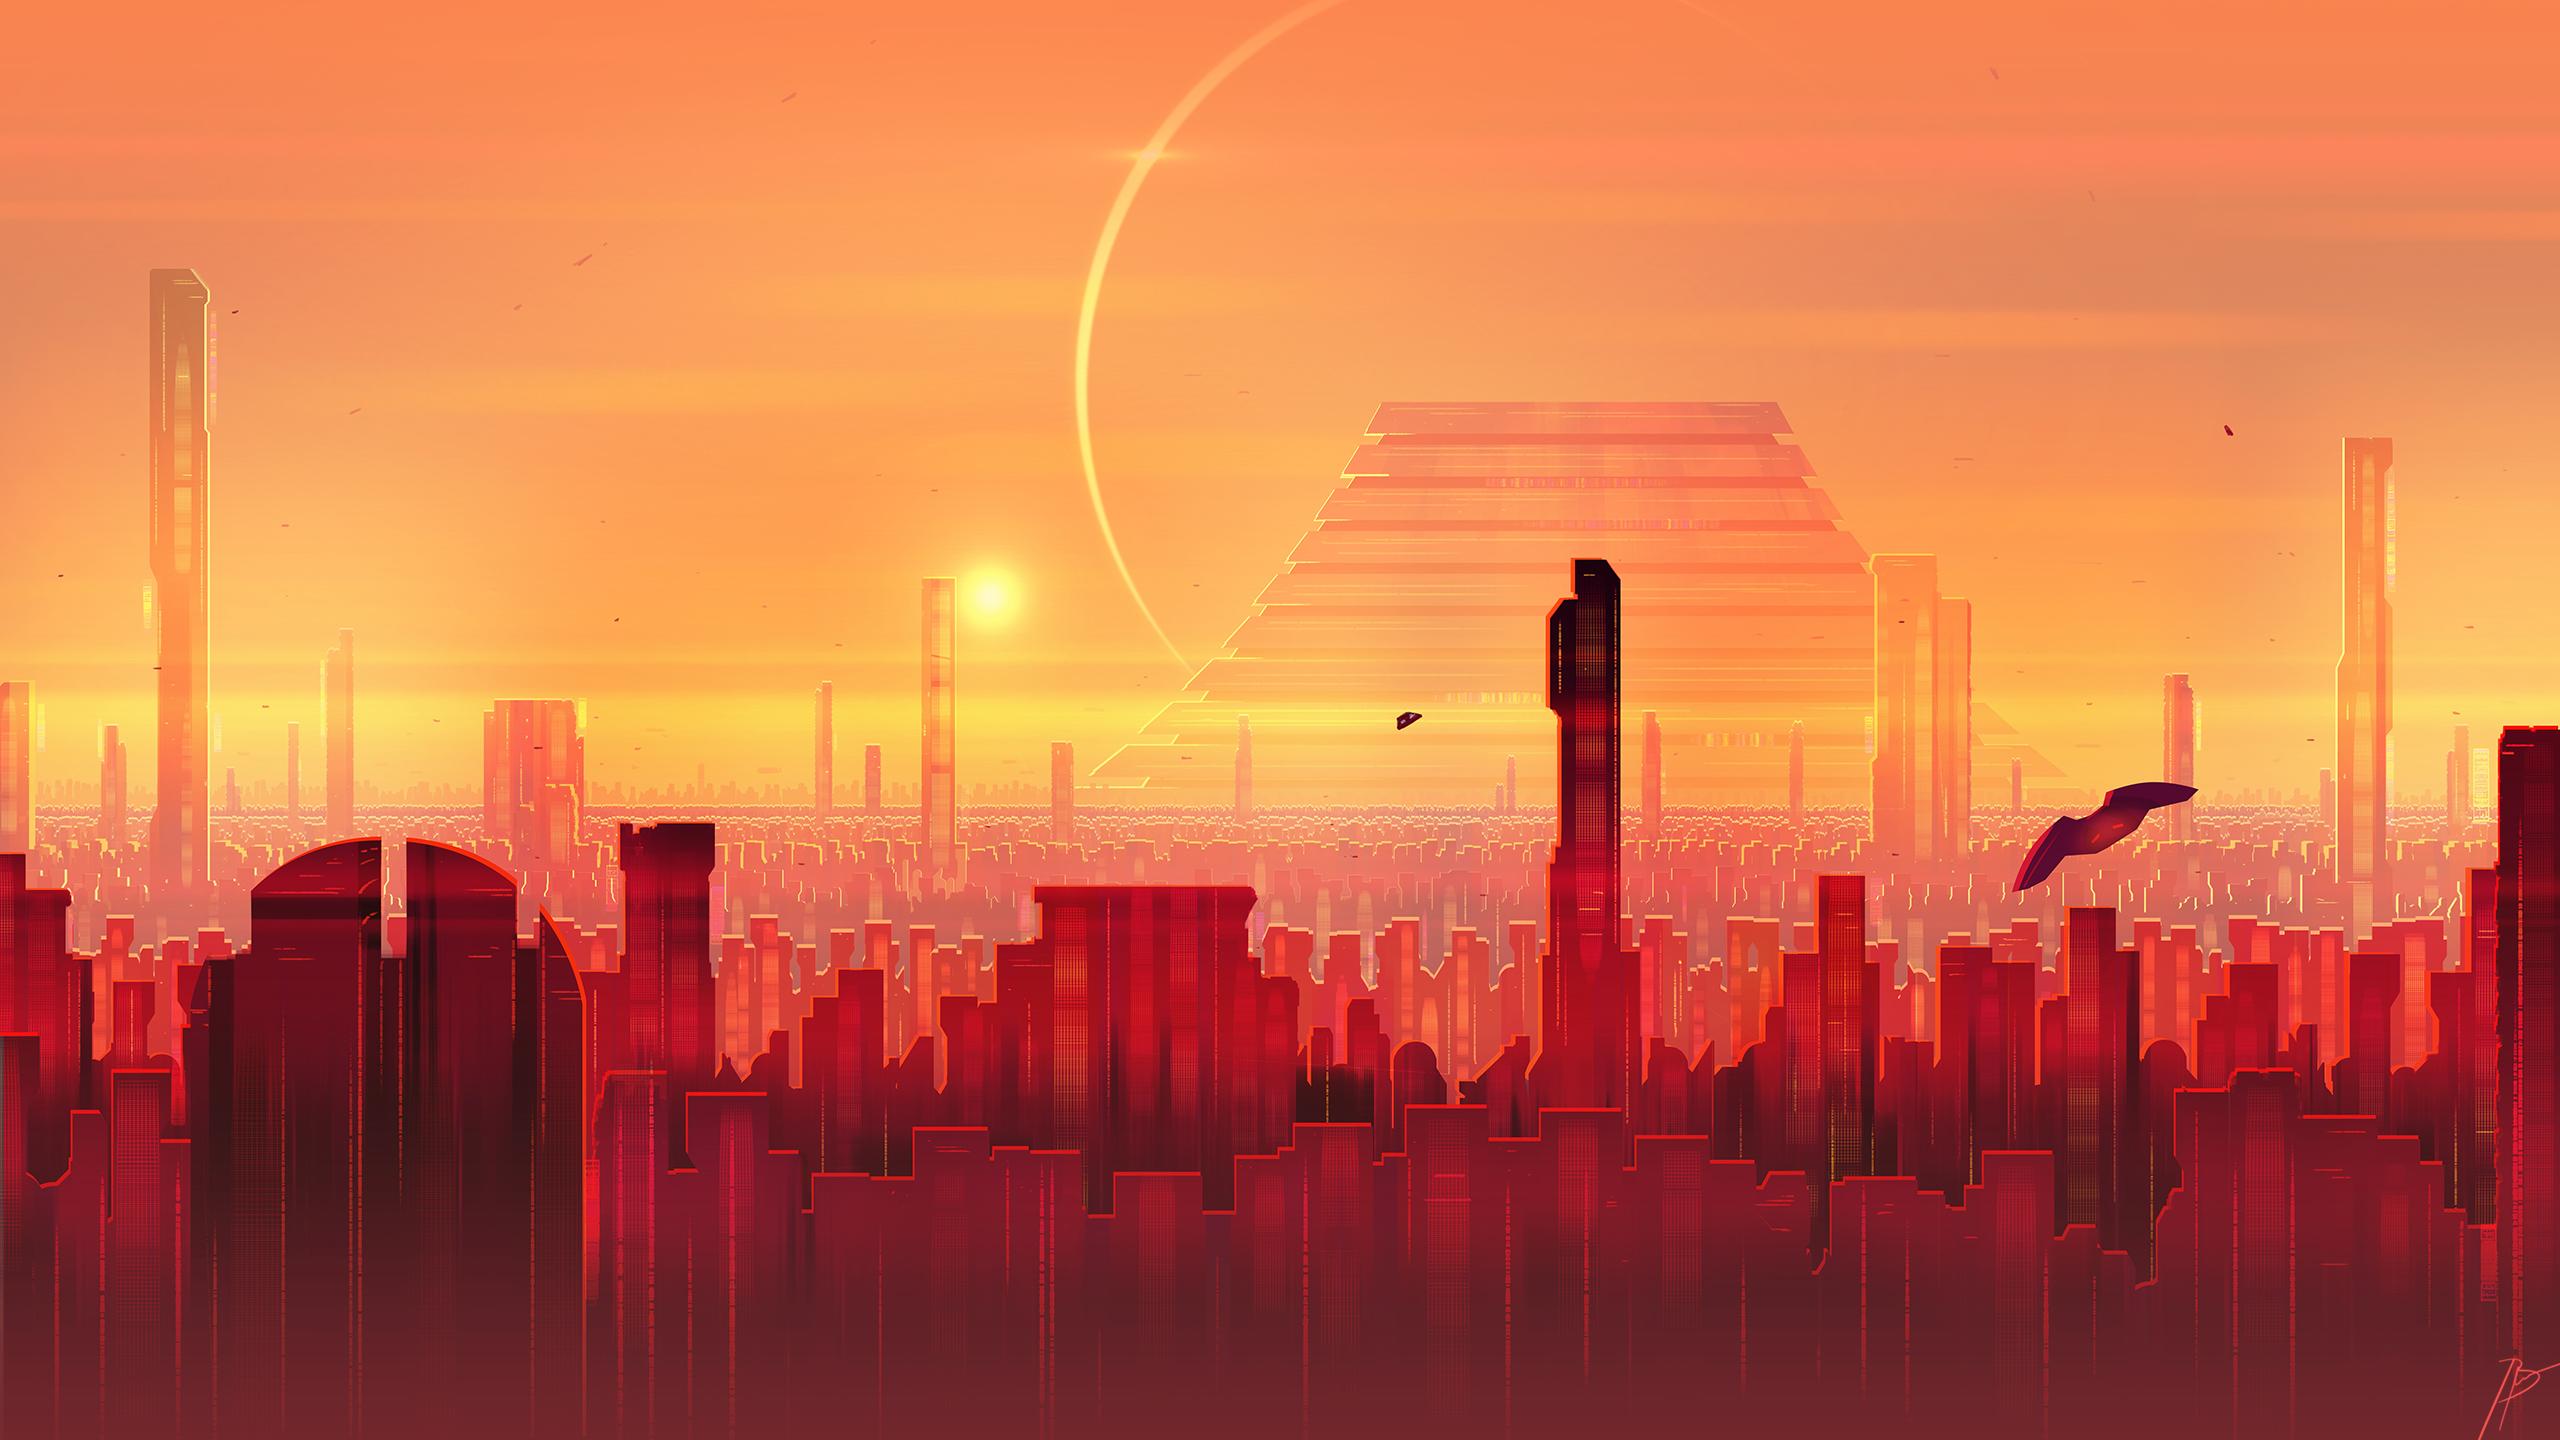 General 2560x1440 JoeyJazz cityscape futuristic science fiction